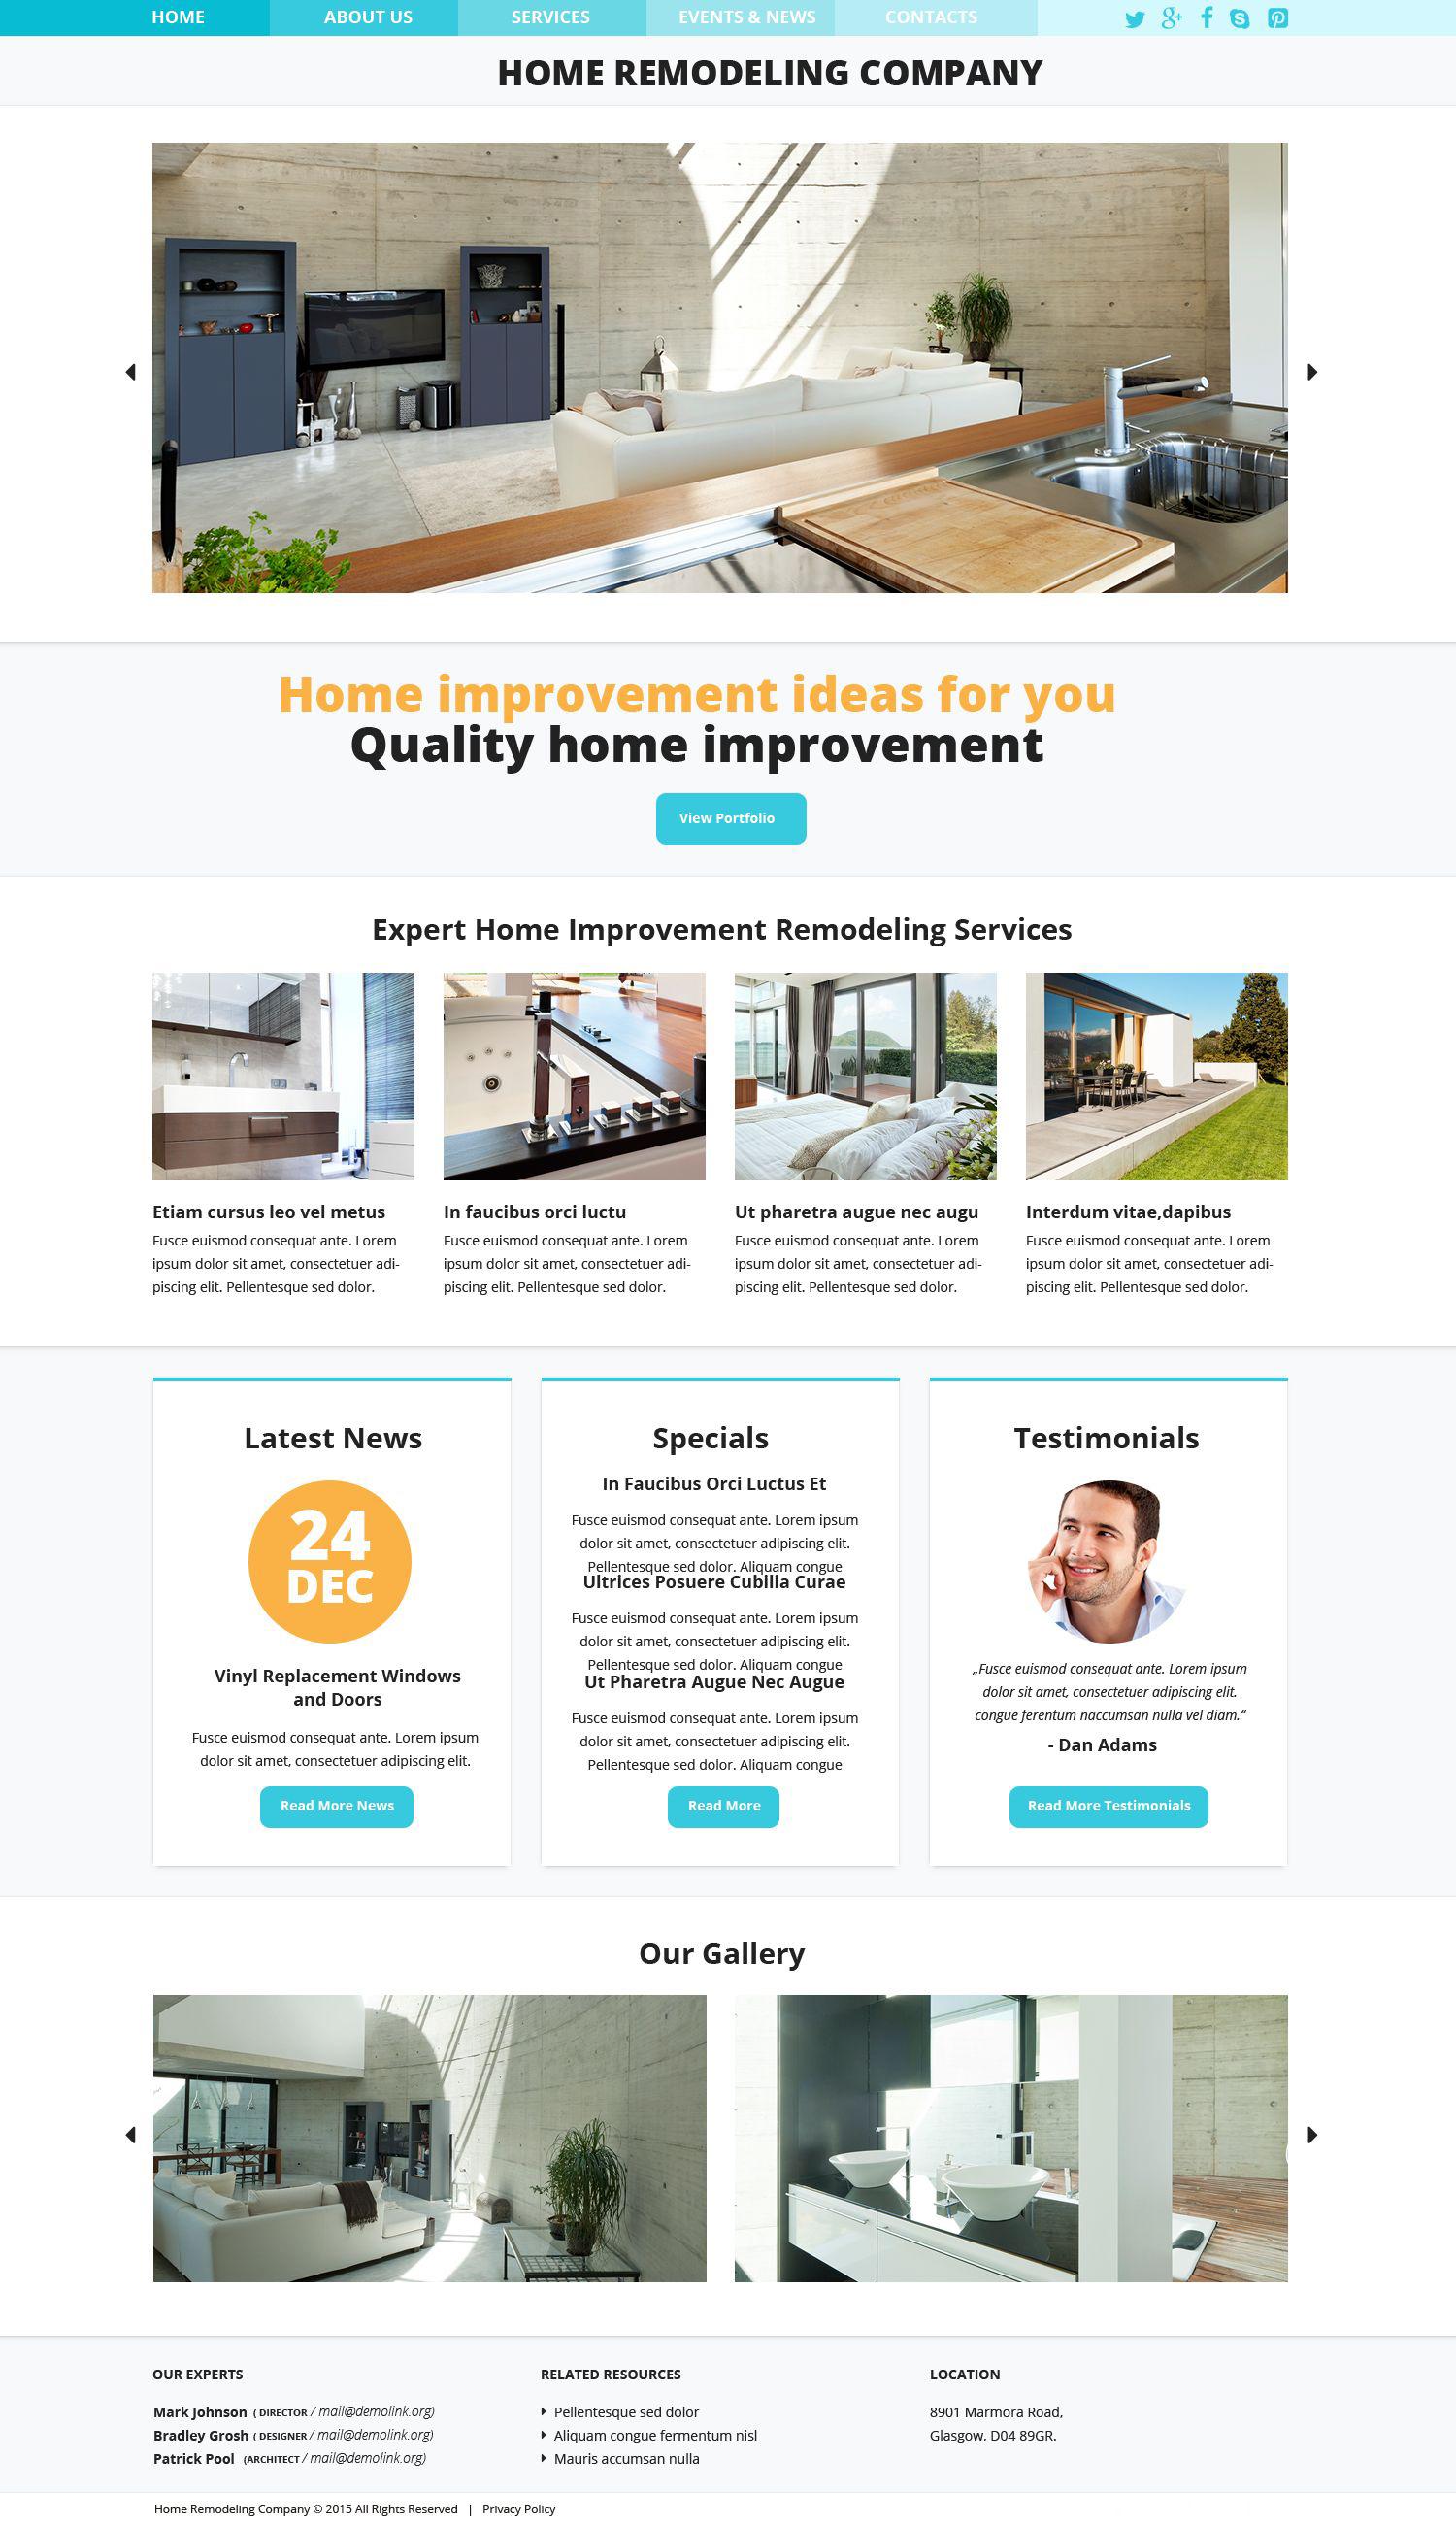 Plantilla Web Responsive para Sitio de Remodelación de casa #52847 - captura de pantalla